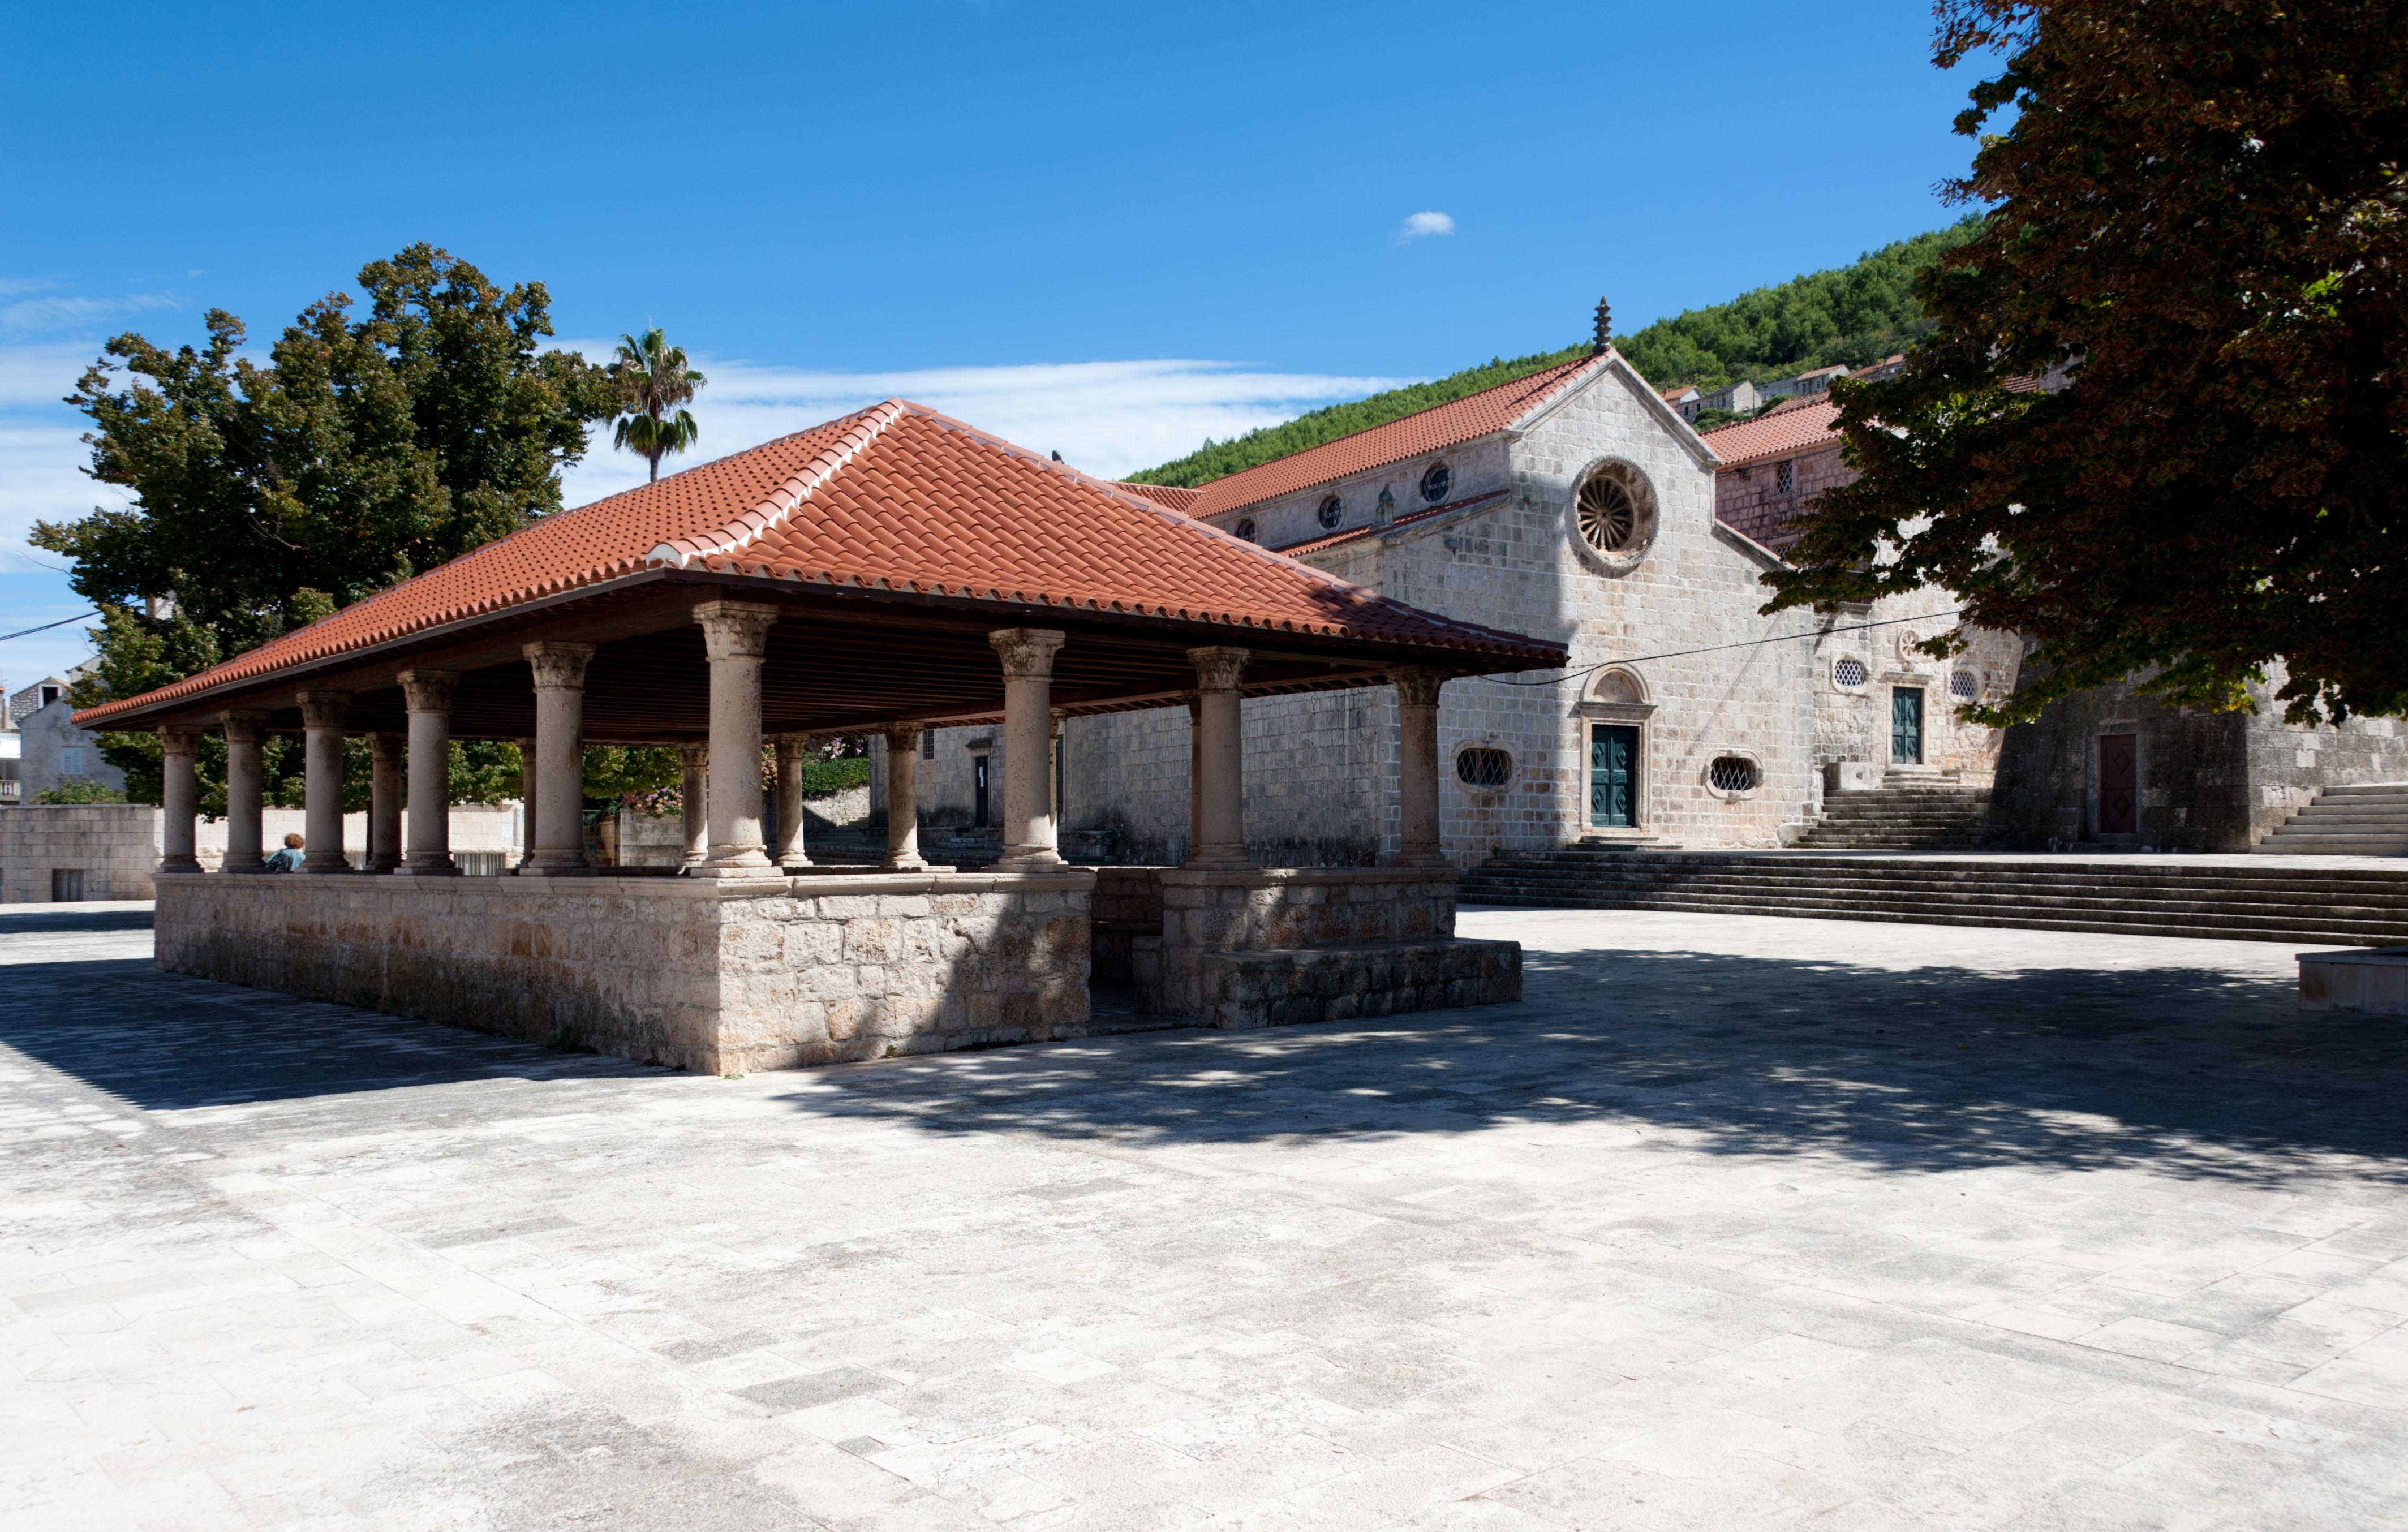 9911-Blato - ile Korcula (Sud Dalmatie)